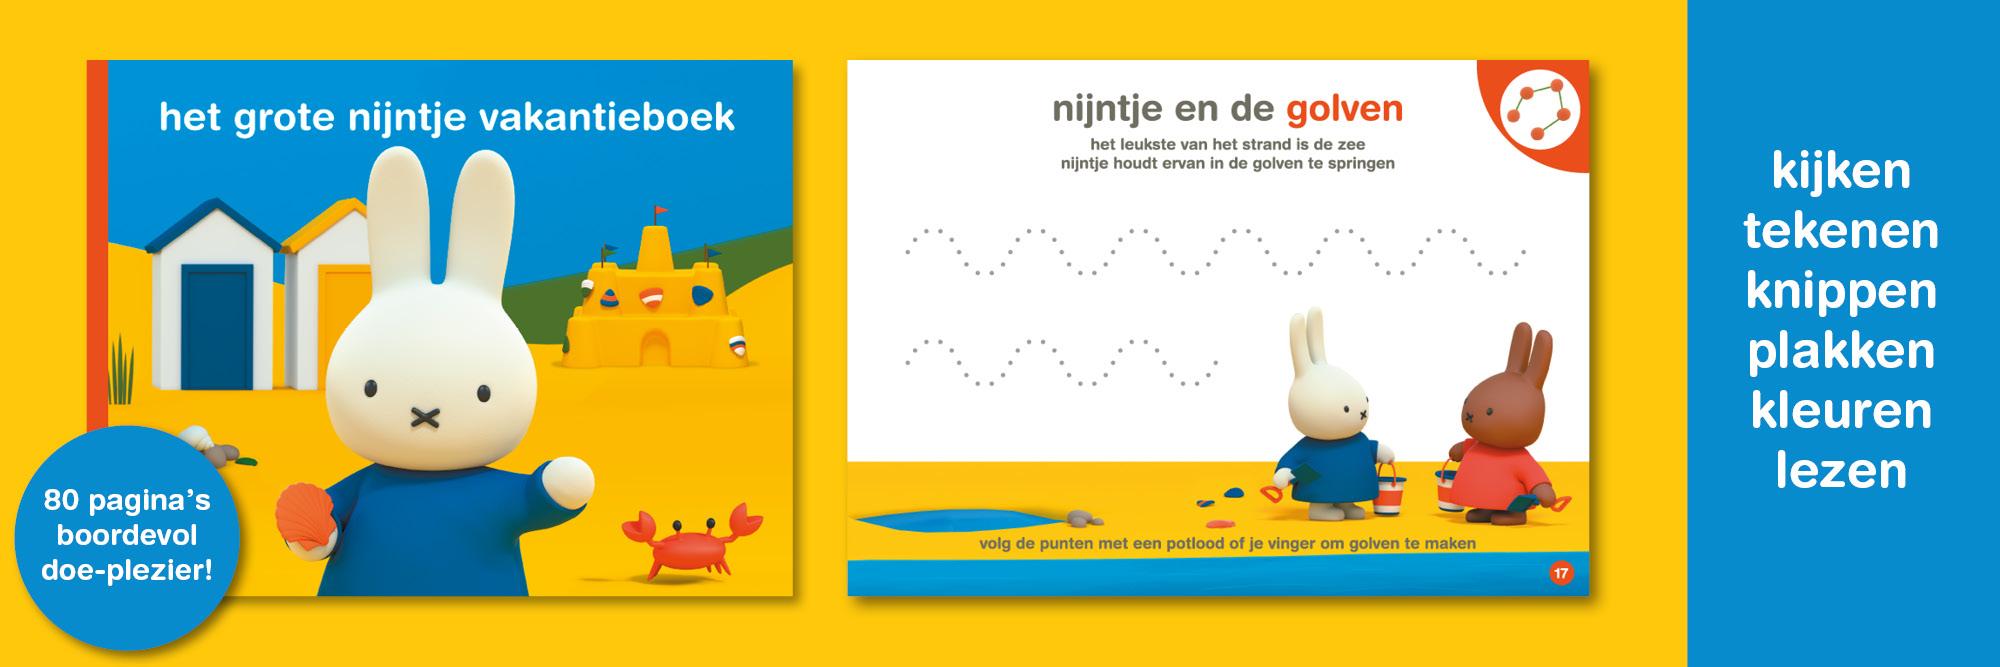 277496 banner vakantieboek 2e5791 original 1523454653